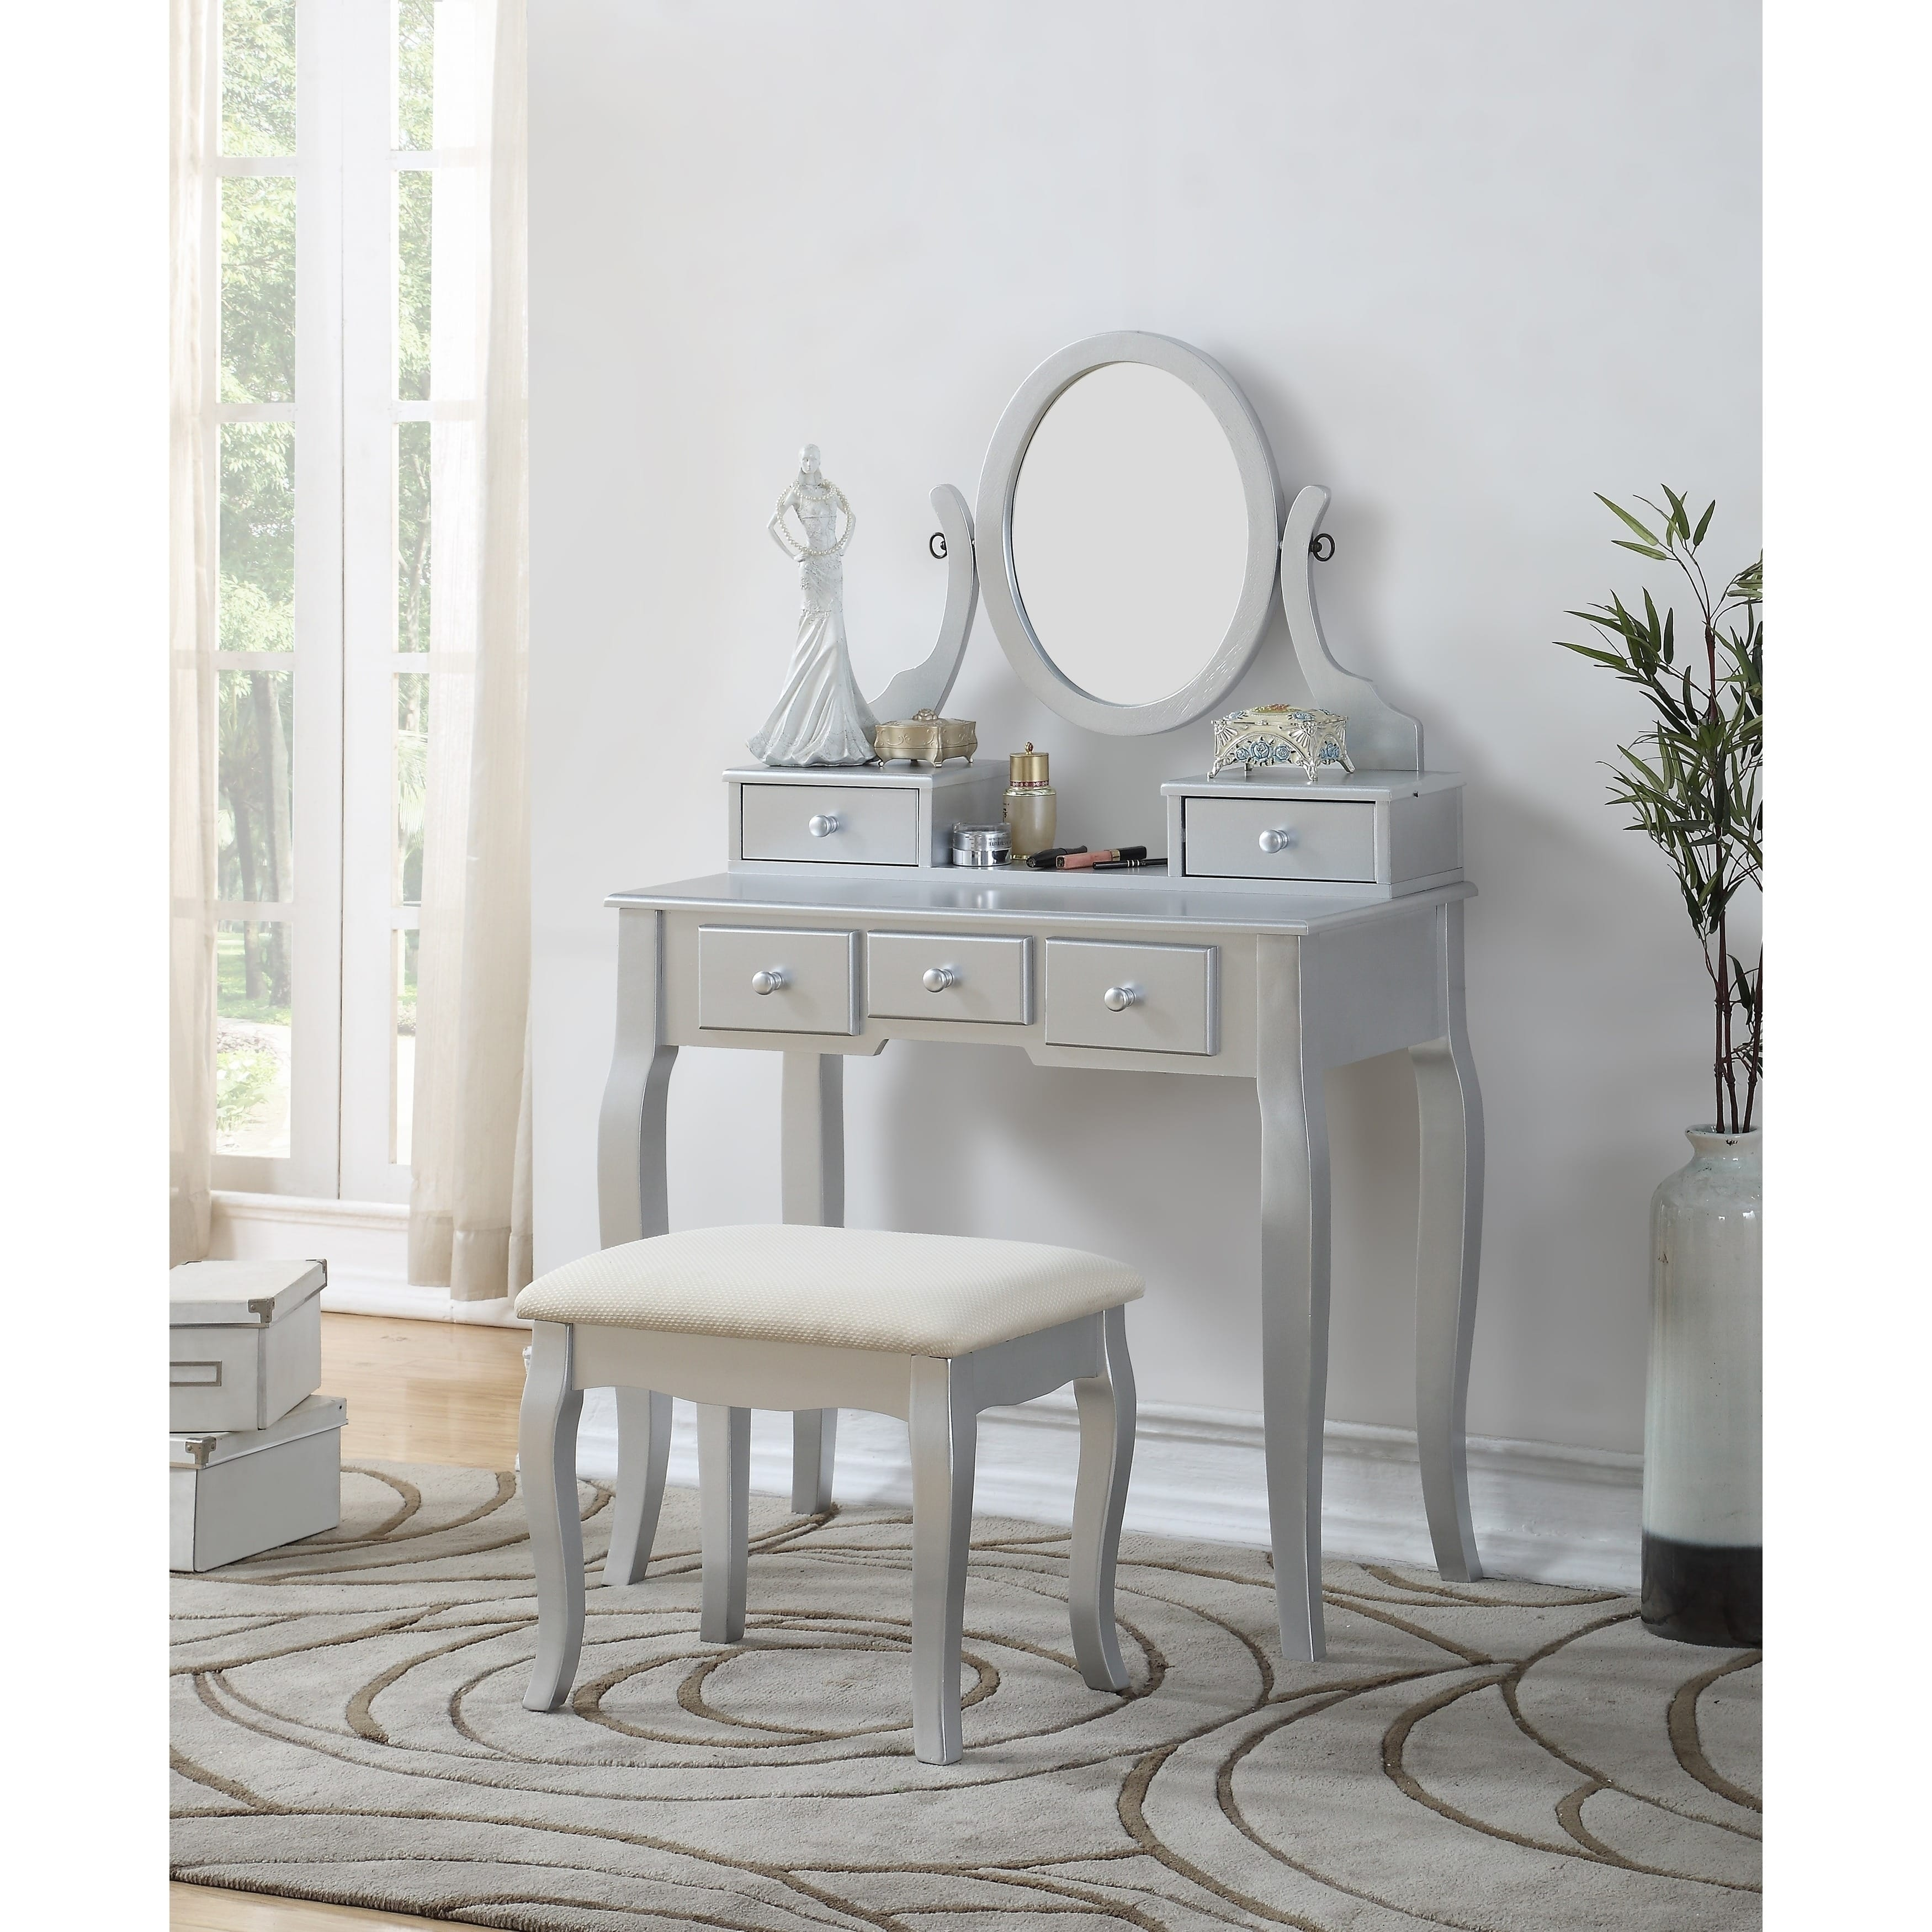 Roundhill Ashley Wood Make Up Vanity Table And Stool Set